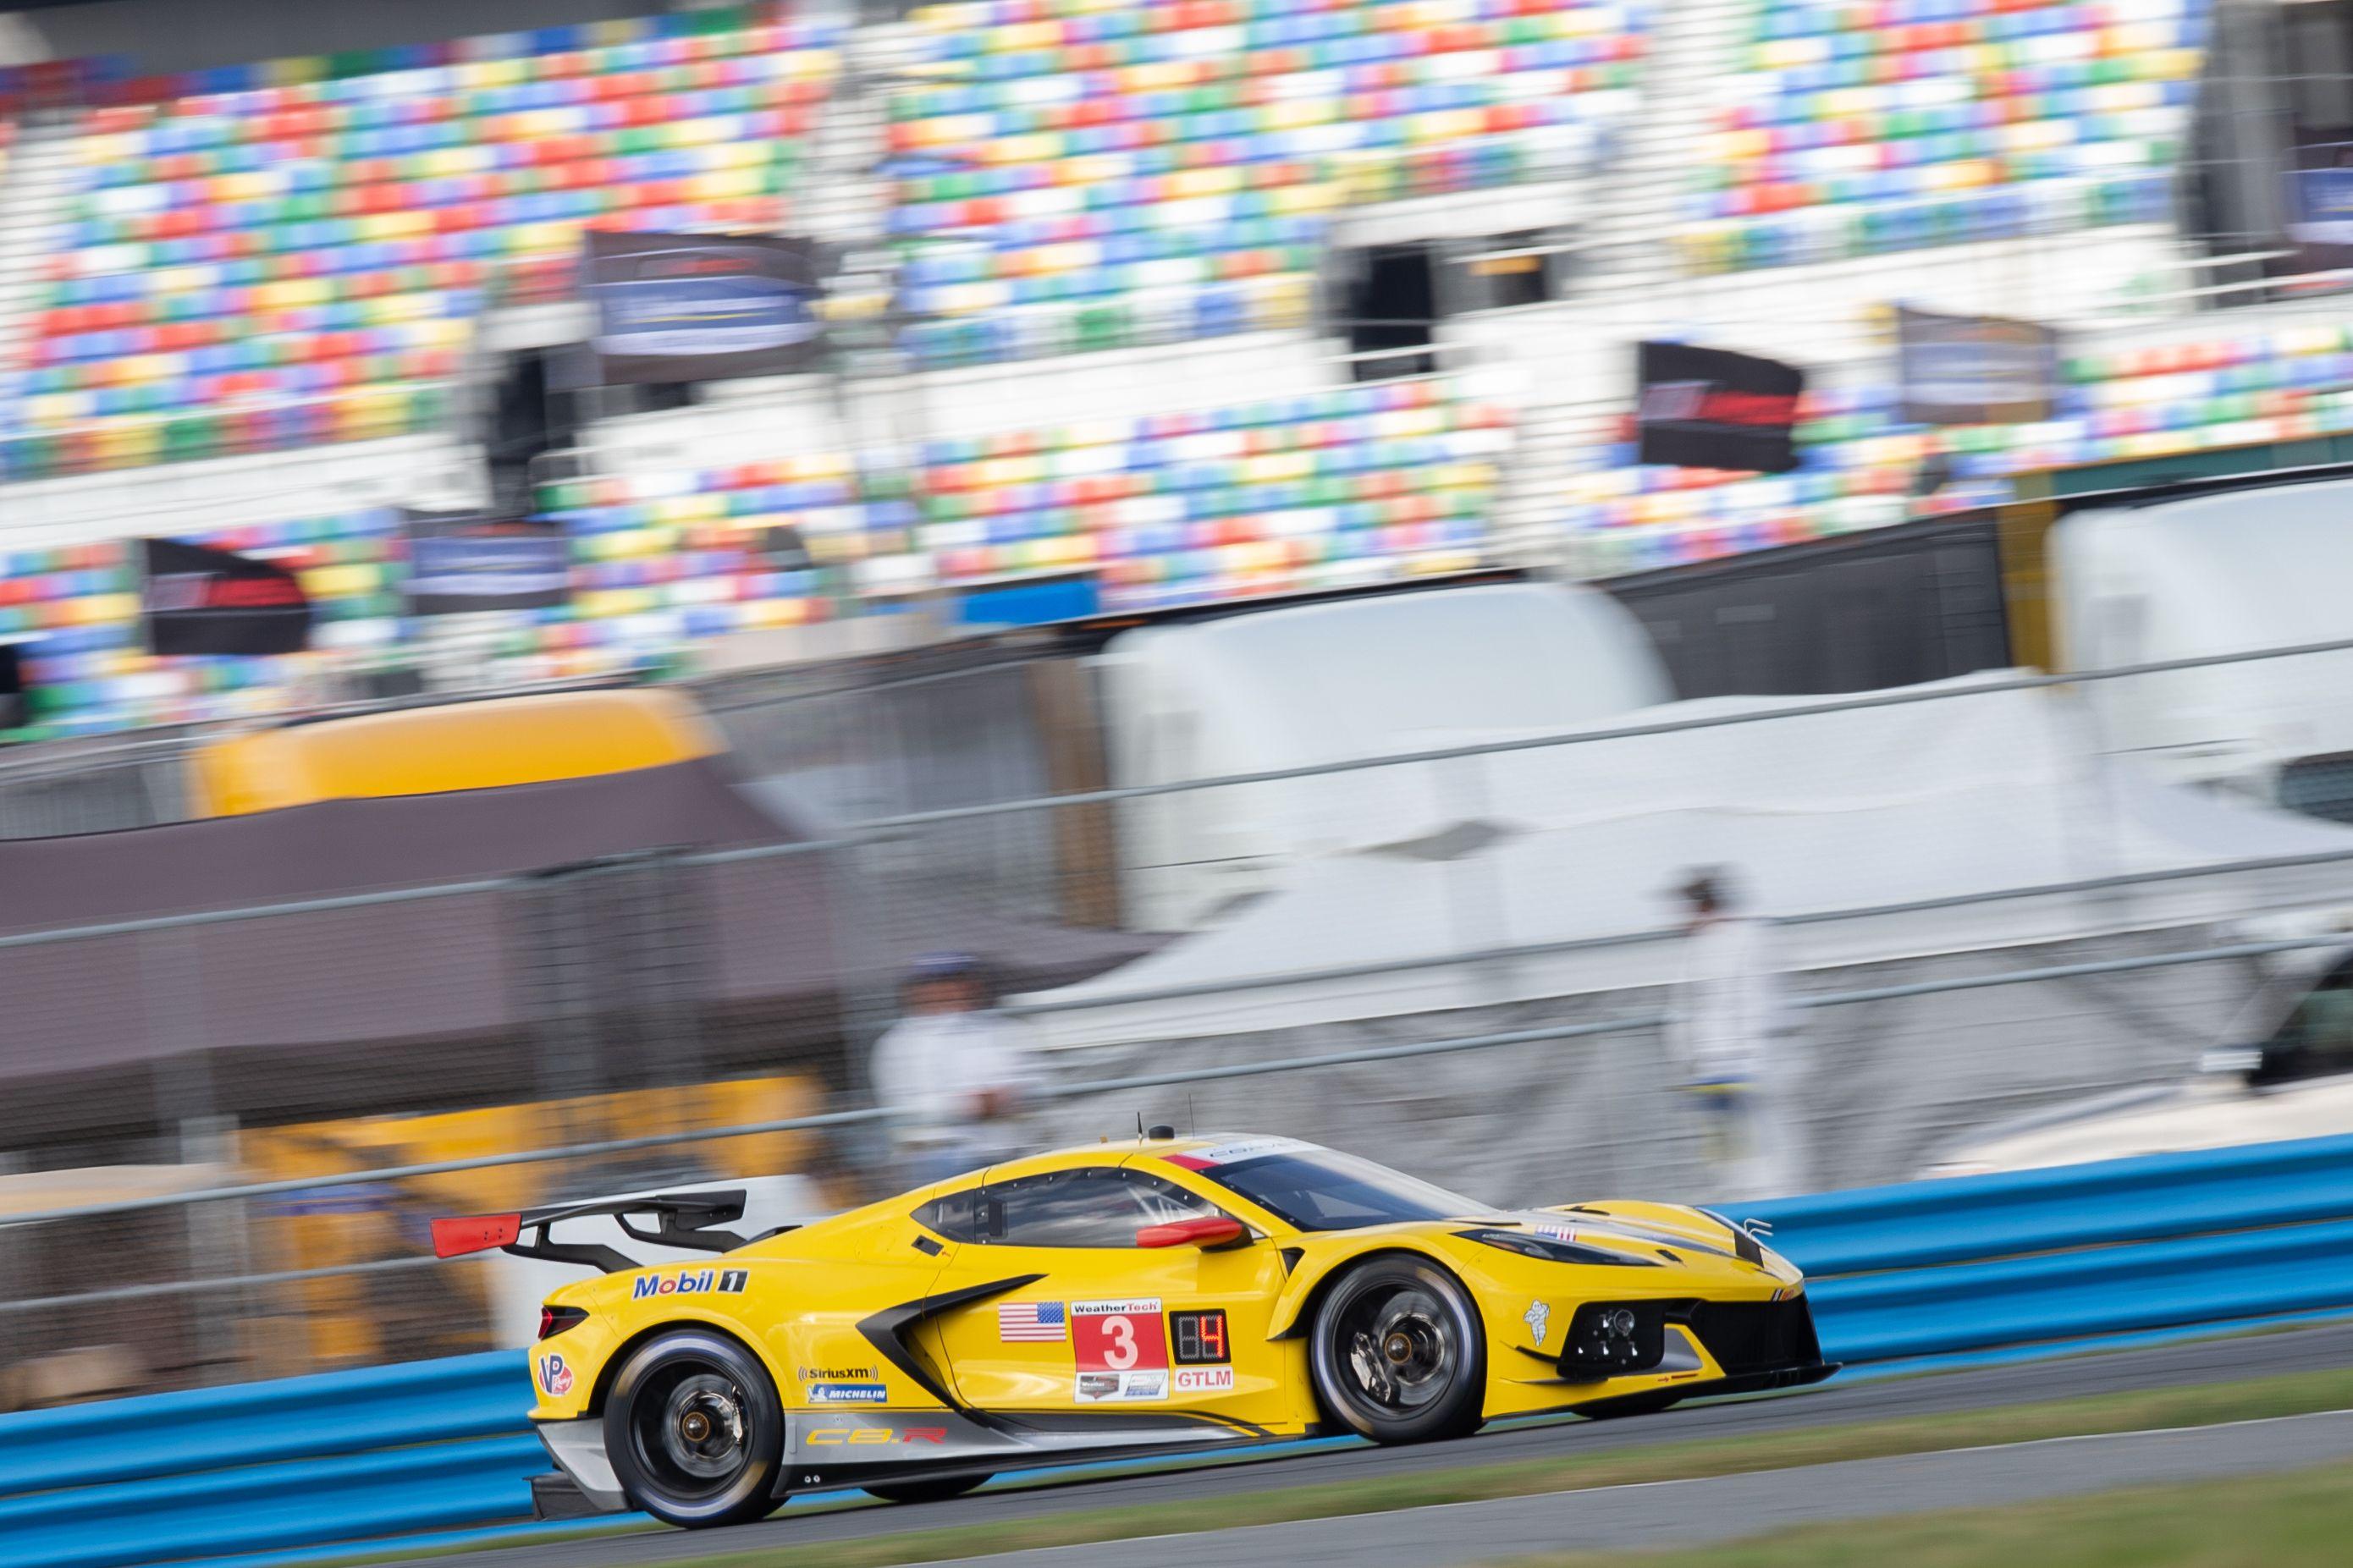 2020 Rolex 24 at Daytona: The Live Blog